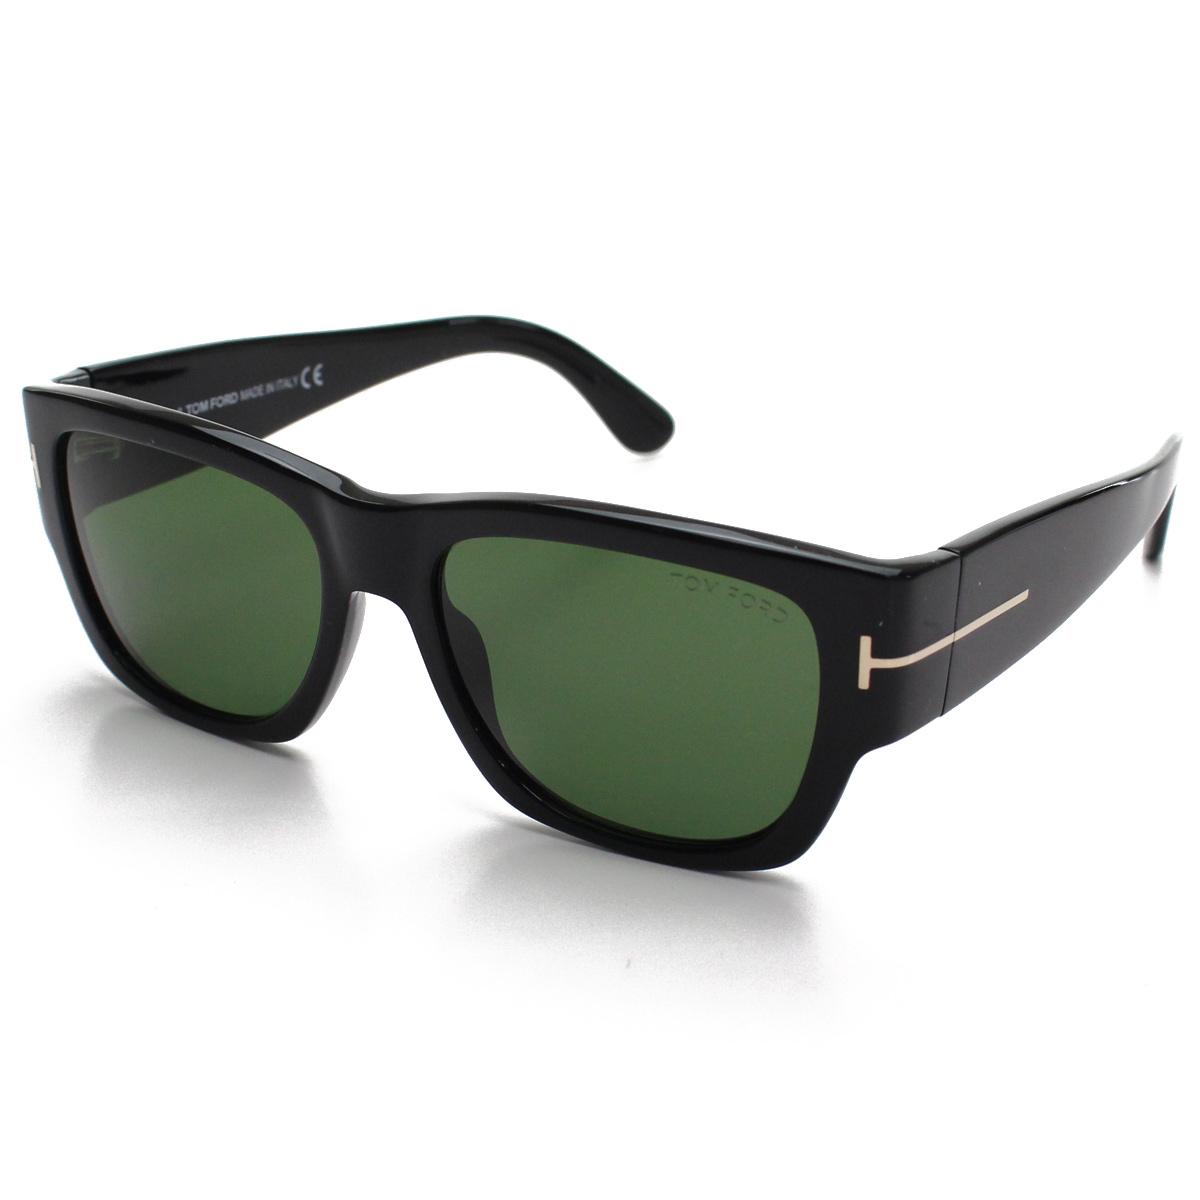 aa6b59761b Bighit The total brand wholesale  Tom Ford TOM FORD sunglasses TF493 01N